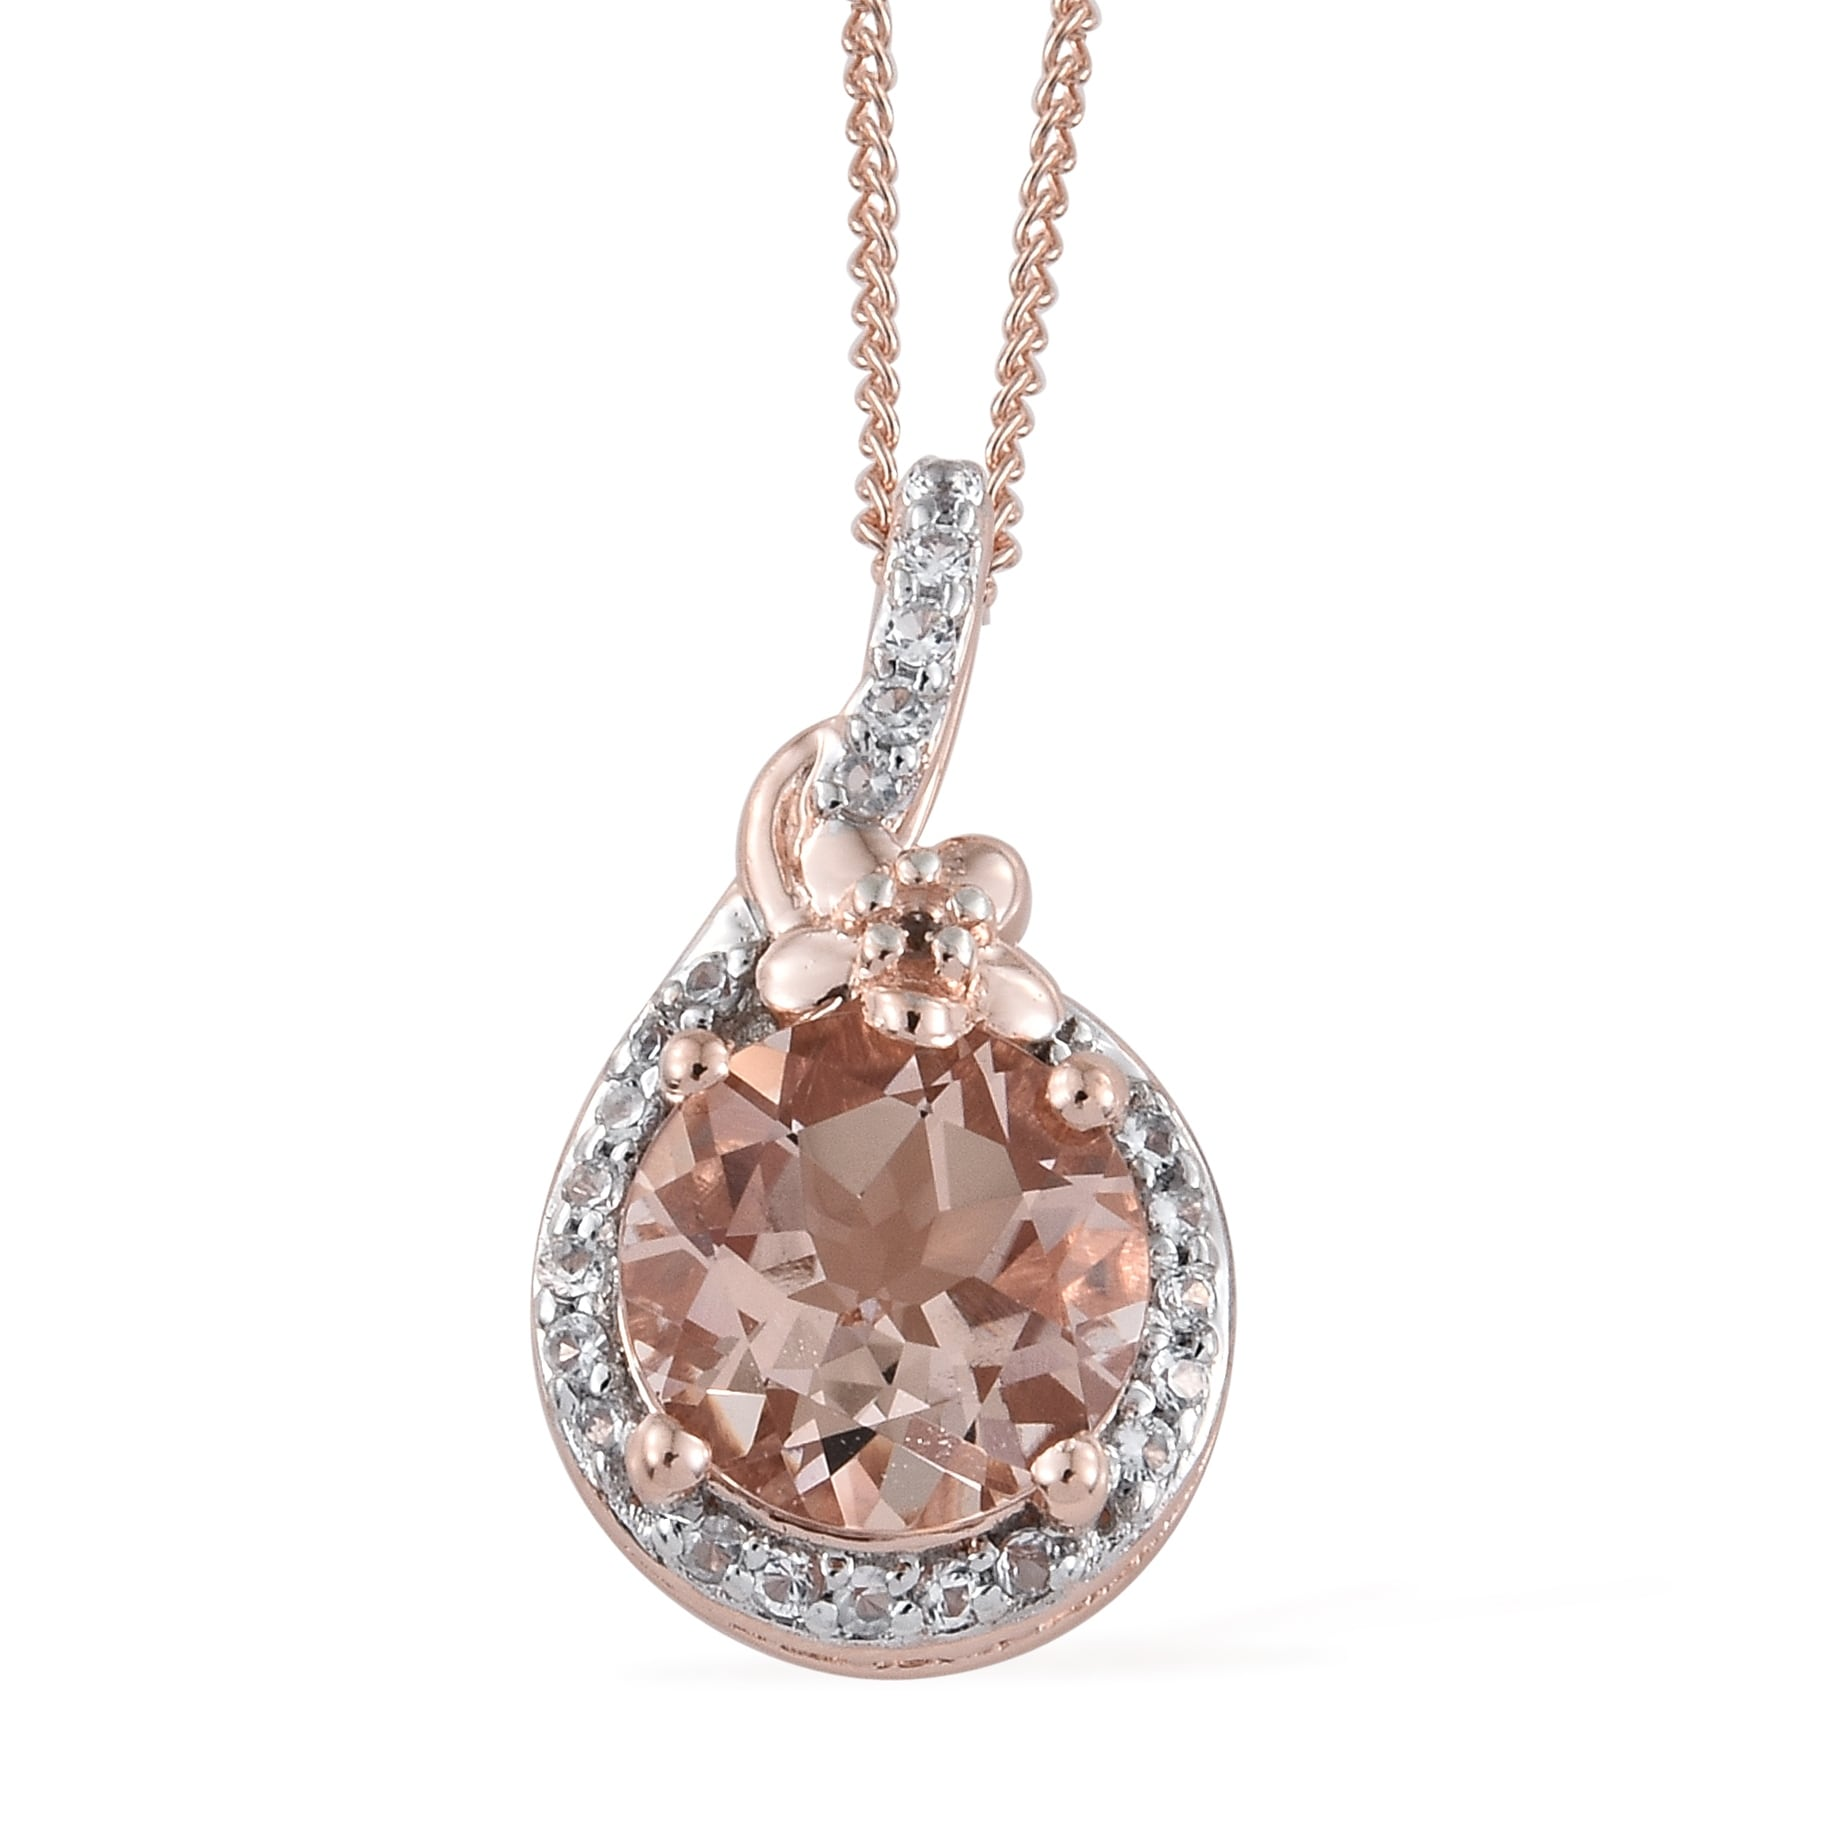 "Morganite Pendant Necklace 925 Sterling Silver Handmade Women Christmas Gift 18/"""